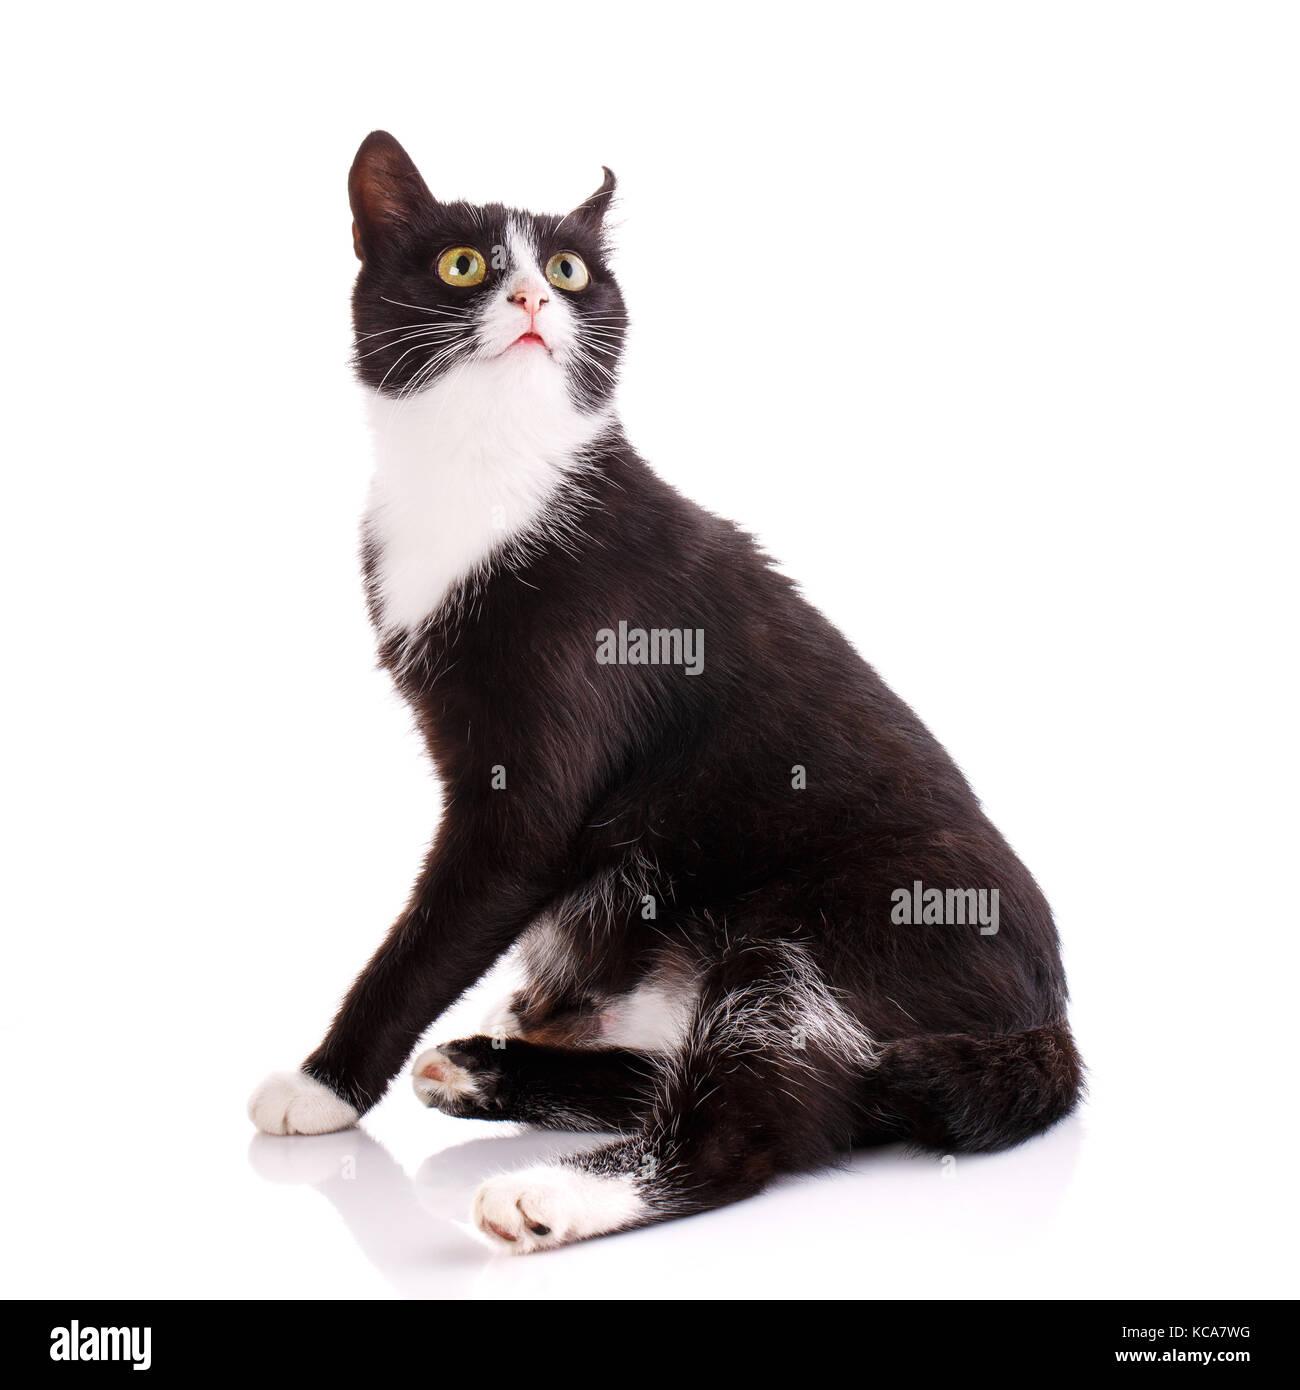 4090b6330 ... Funny Cat Surprised Face: Cat Surprised Stock Photos & Cat Surprised  Stock Images